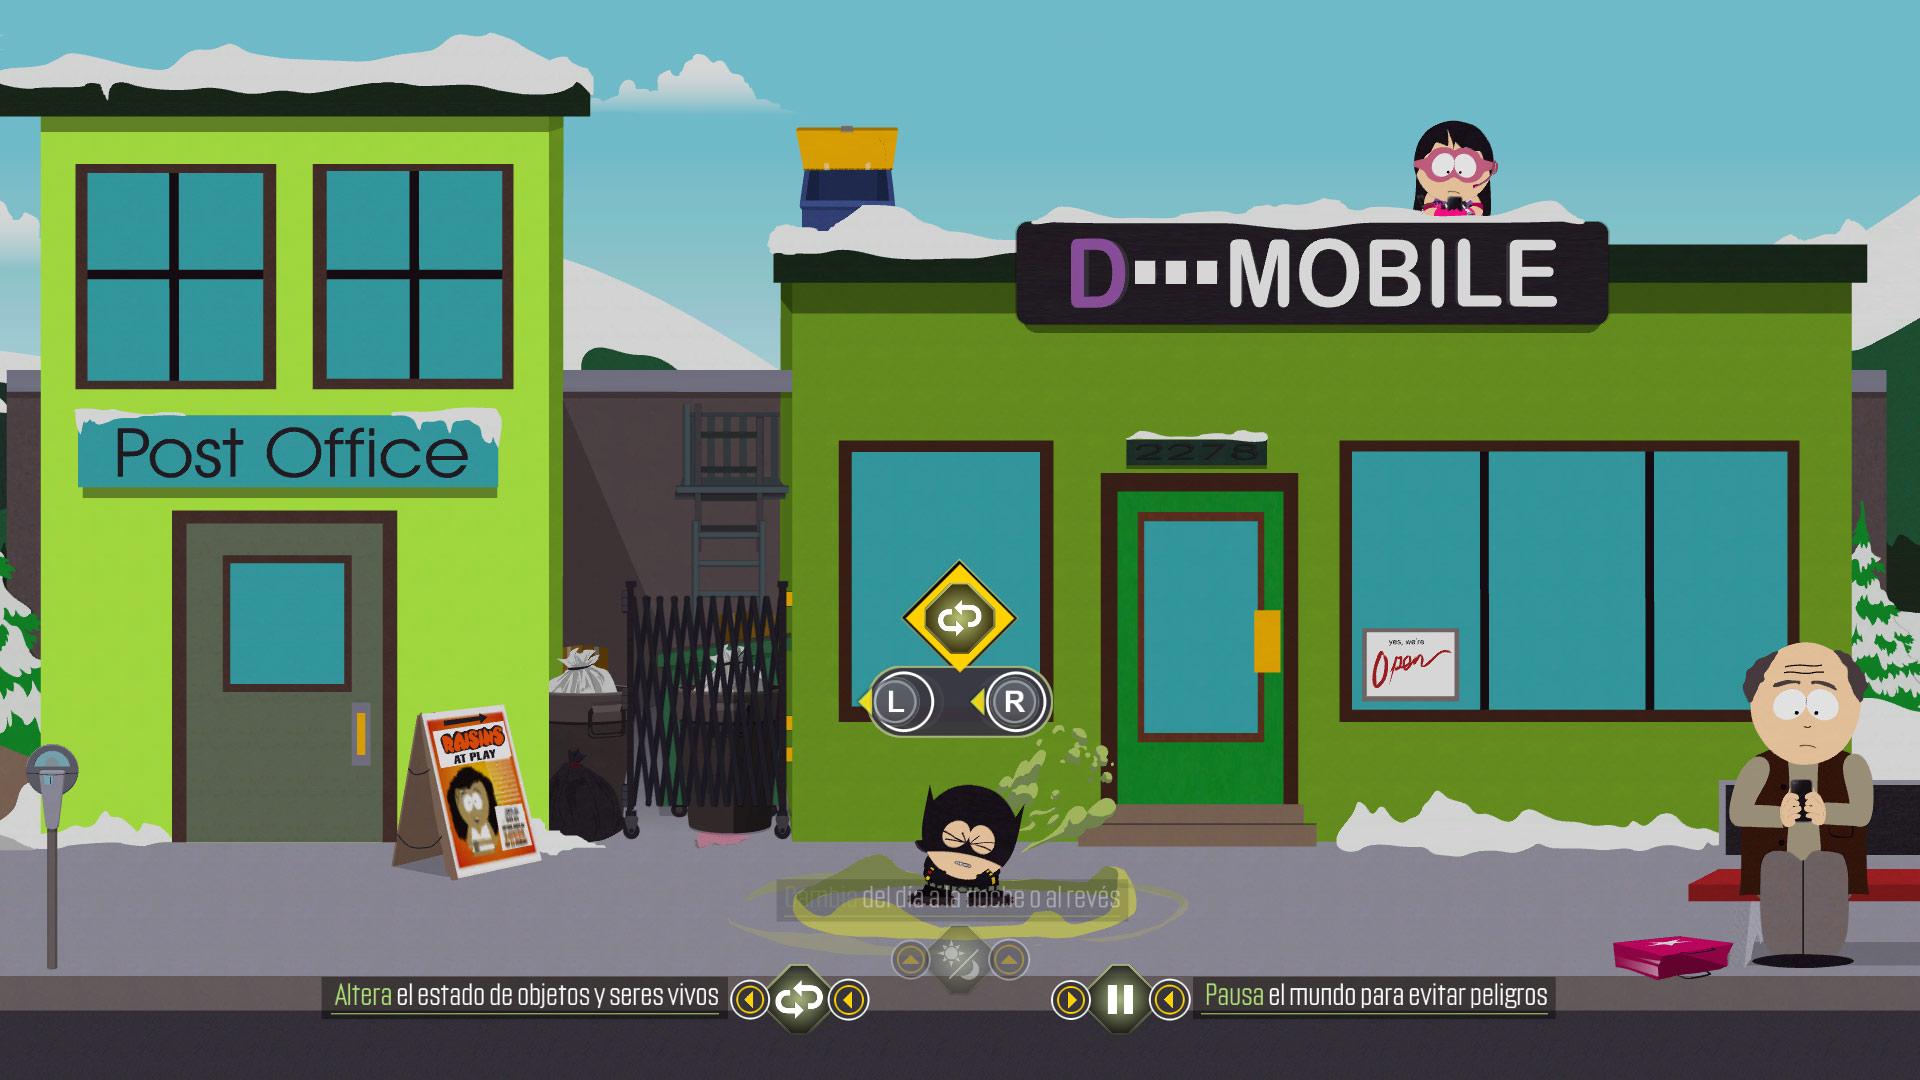 Análisis de South Park Retaguardia en Peligro